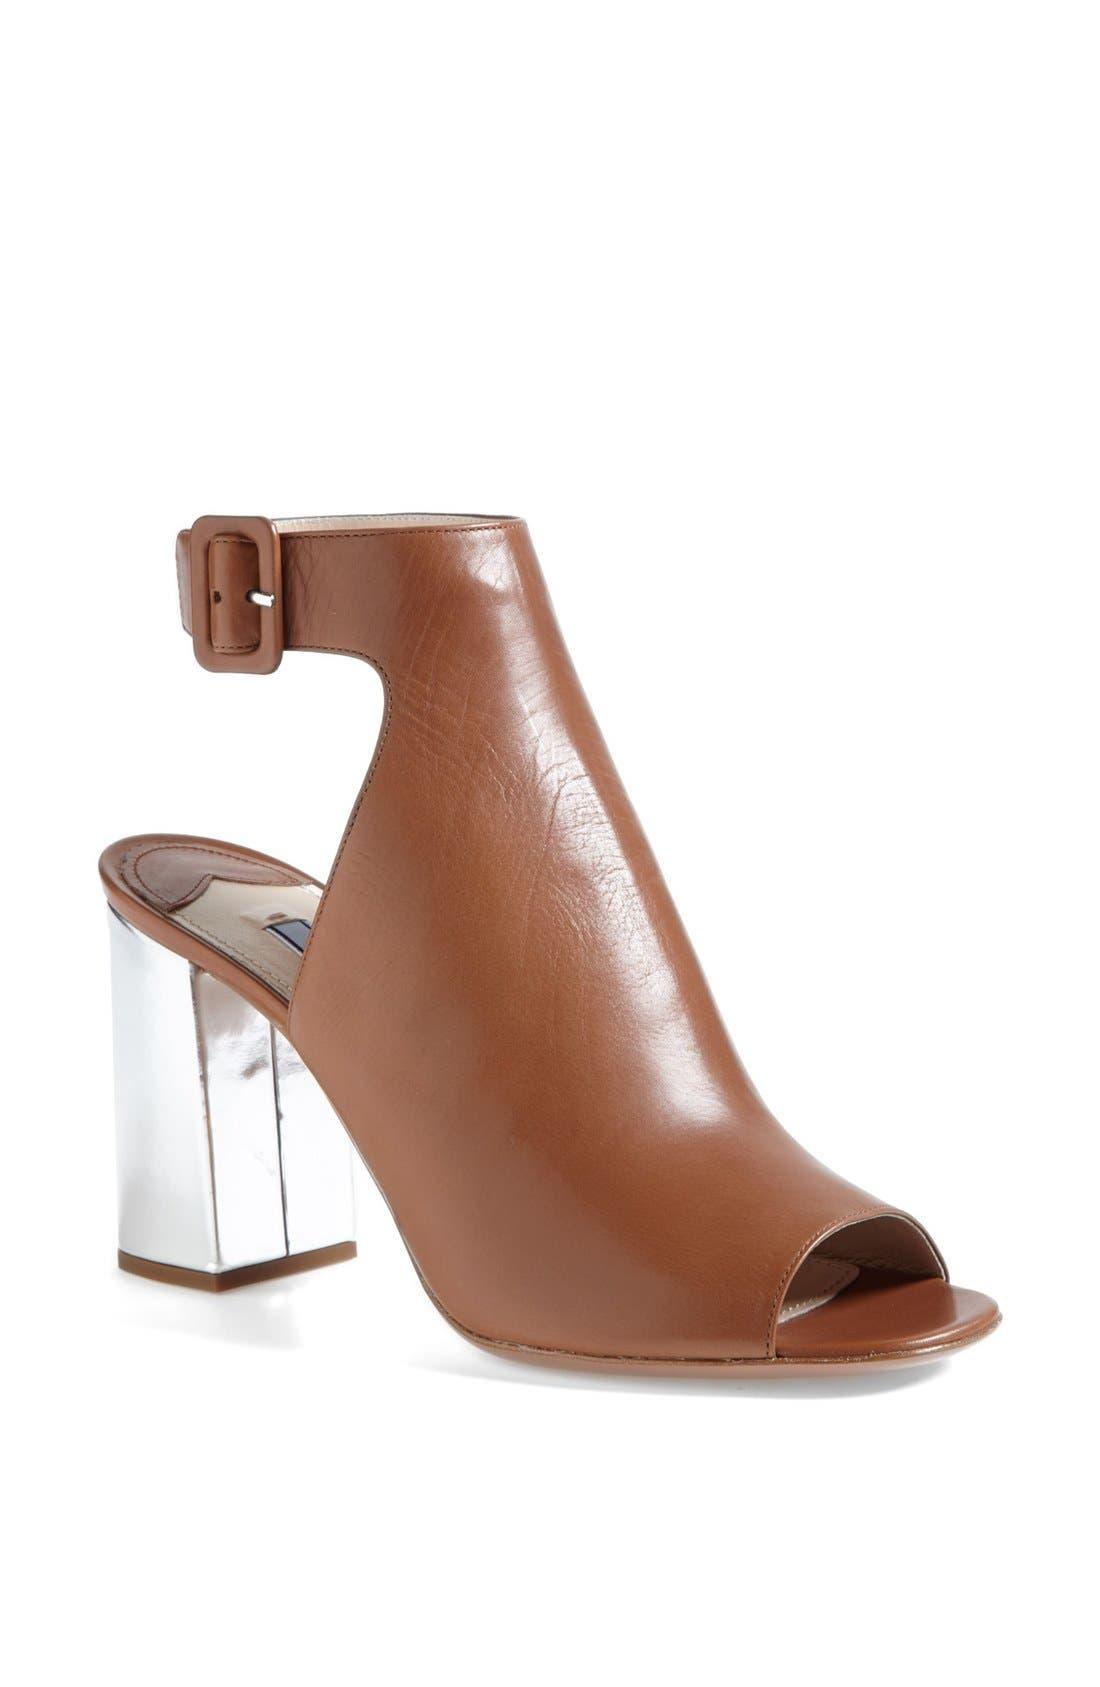 Main Image - Prada Glove Slingback Sandal (Women)